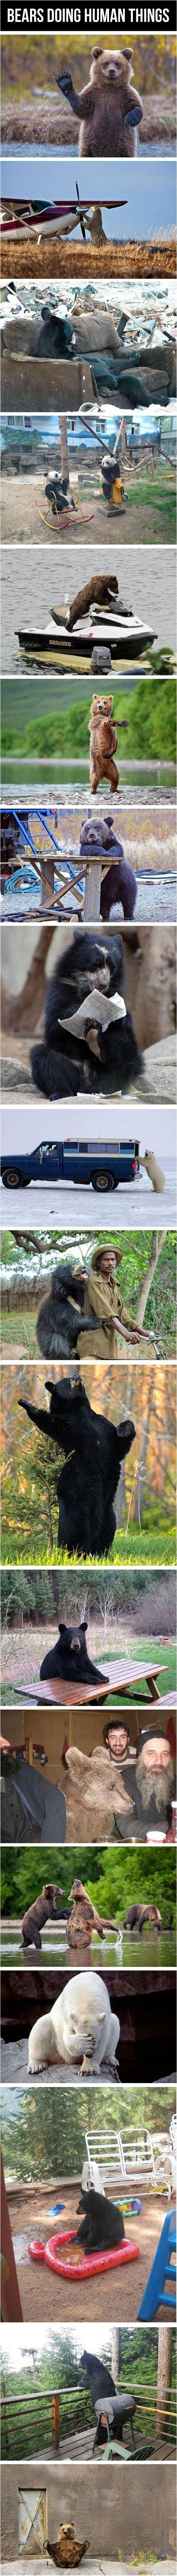 Bears doing human things. . BEARS DOING HUMAN THINGS Bears doing human things BEARS DOING HUMAN THINGS